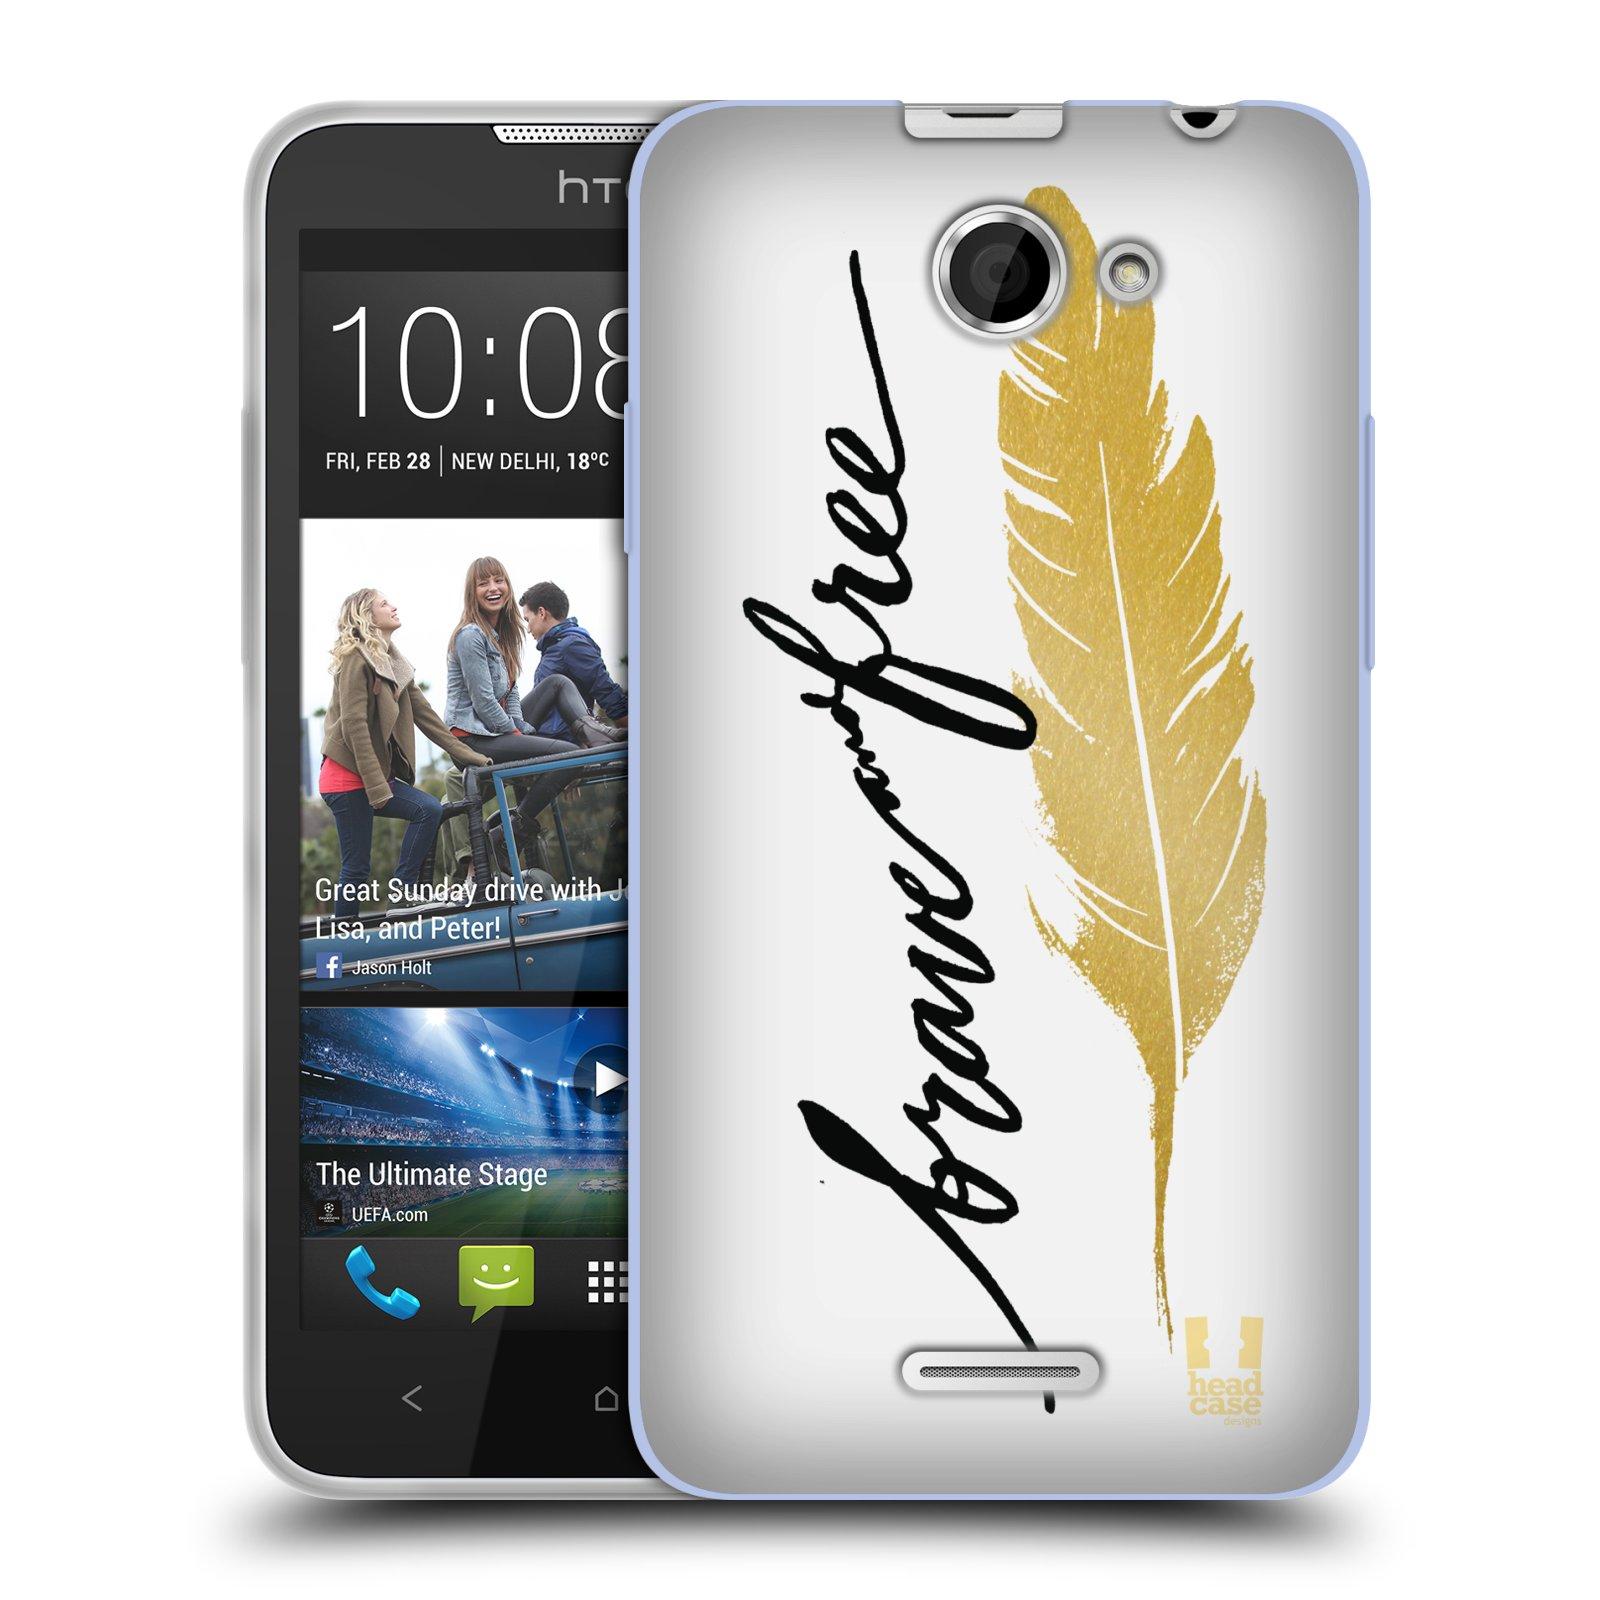 Silikonové pouzdro na mobil HTC Desire 516 HEAD CASE PÍRKO ZLATÉ FREE (Silikonový kryt či obal na mobilní telefon HTC Desire 516 Dual SIM)